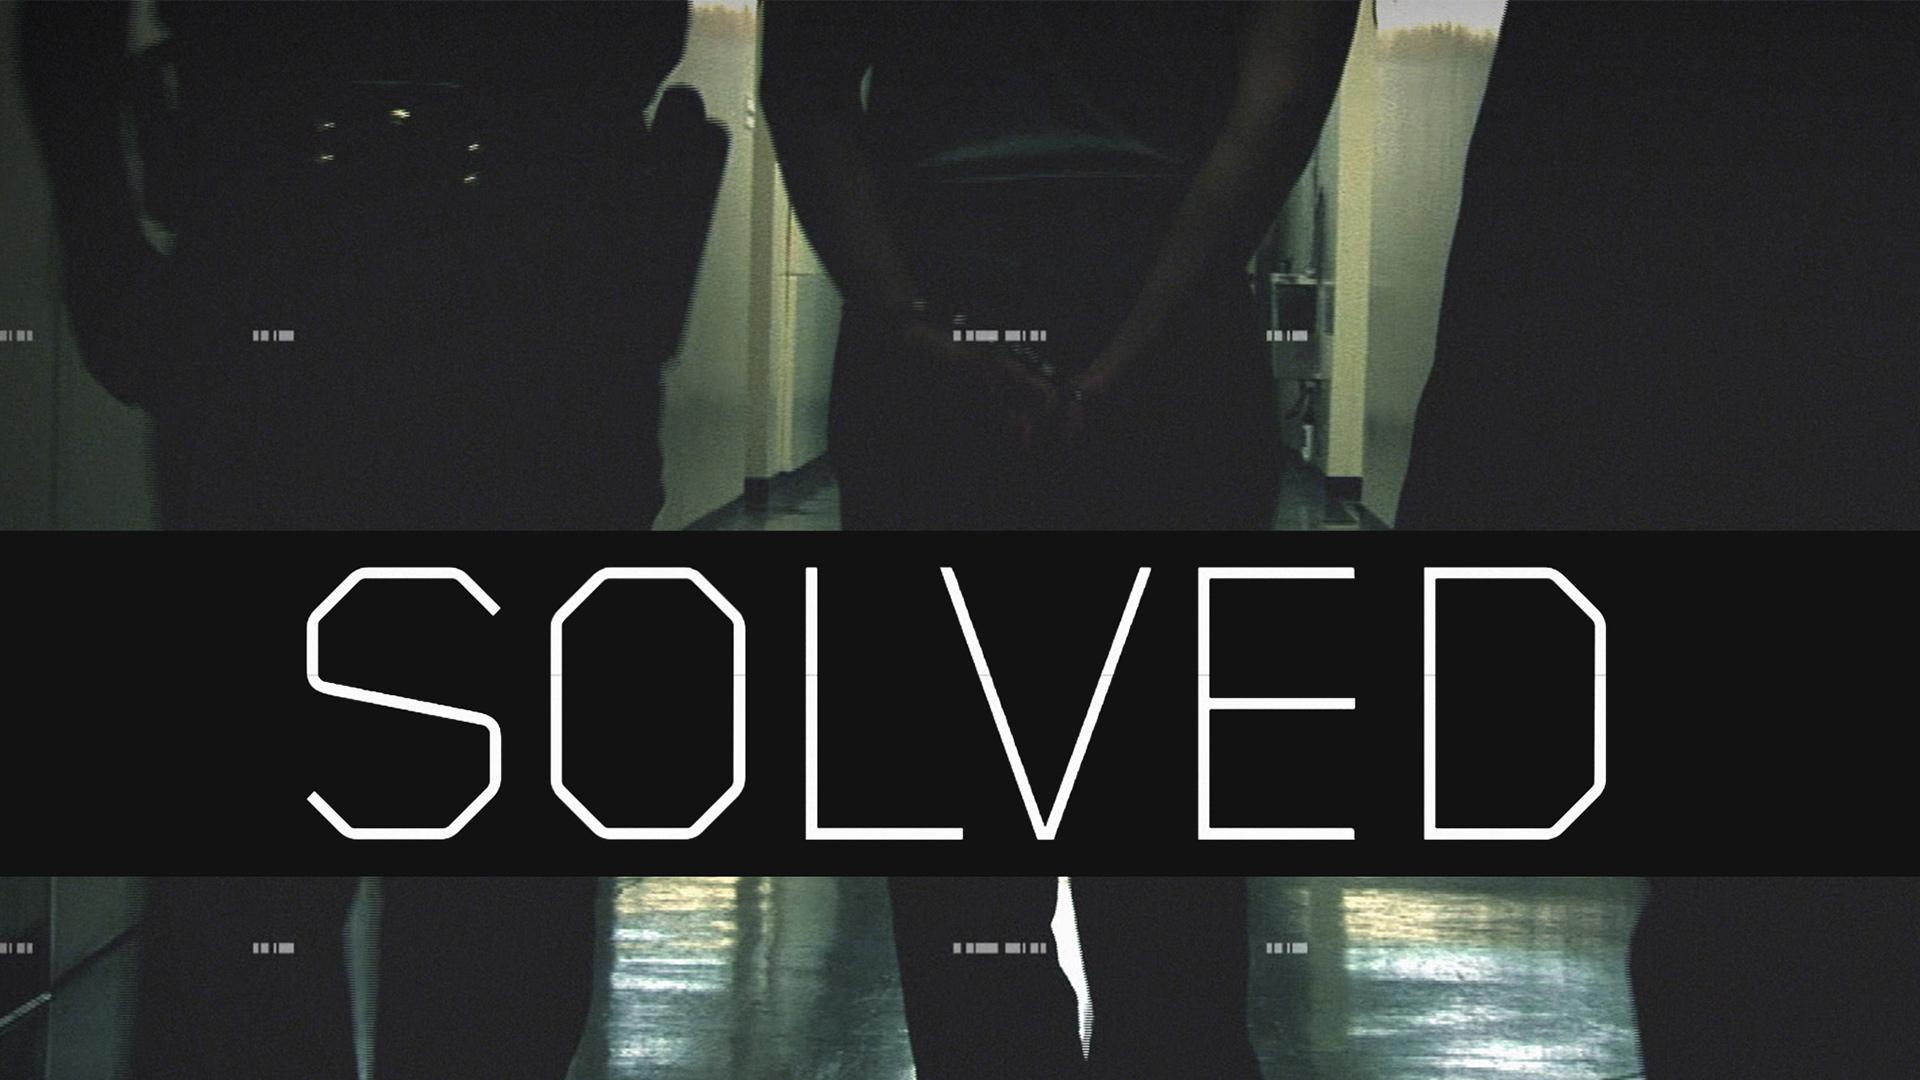 Solved Season 1